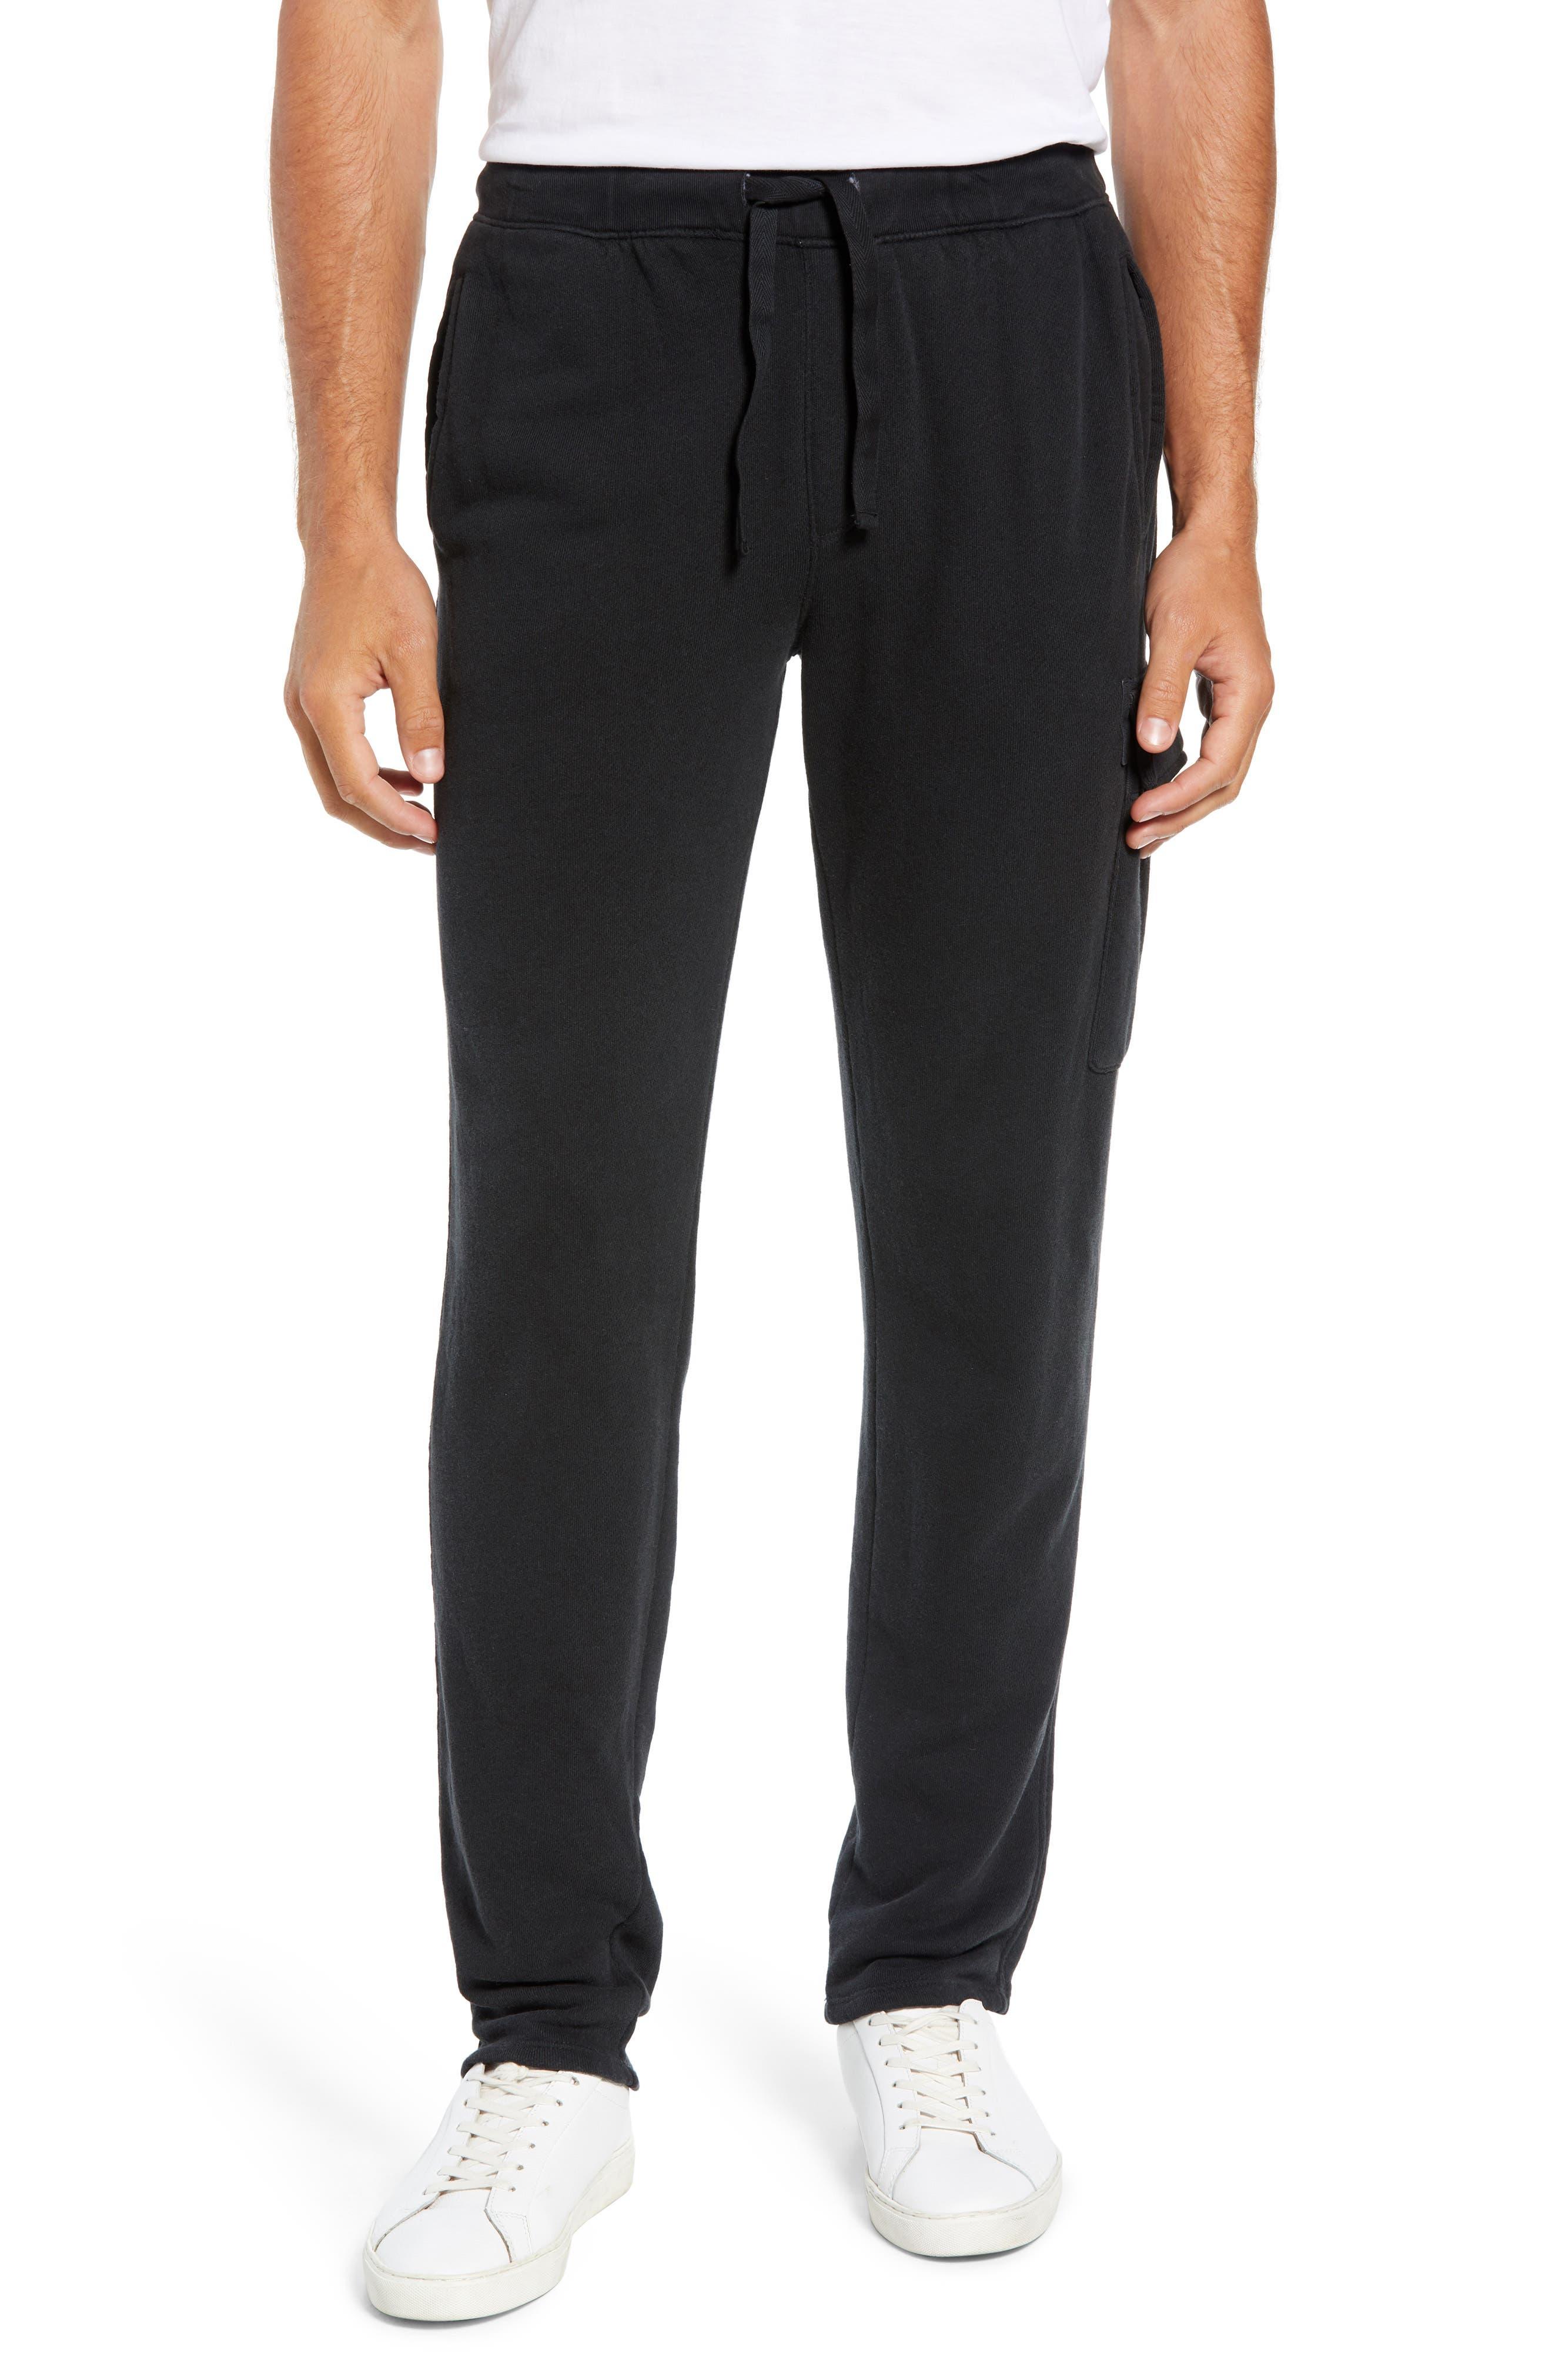 Slim Fit Sweatpants,                             Main thumbnail 1, color,                             CHARCOAL